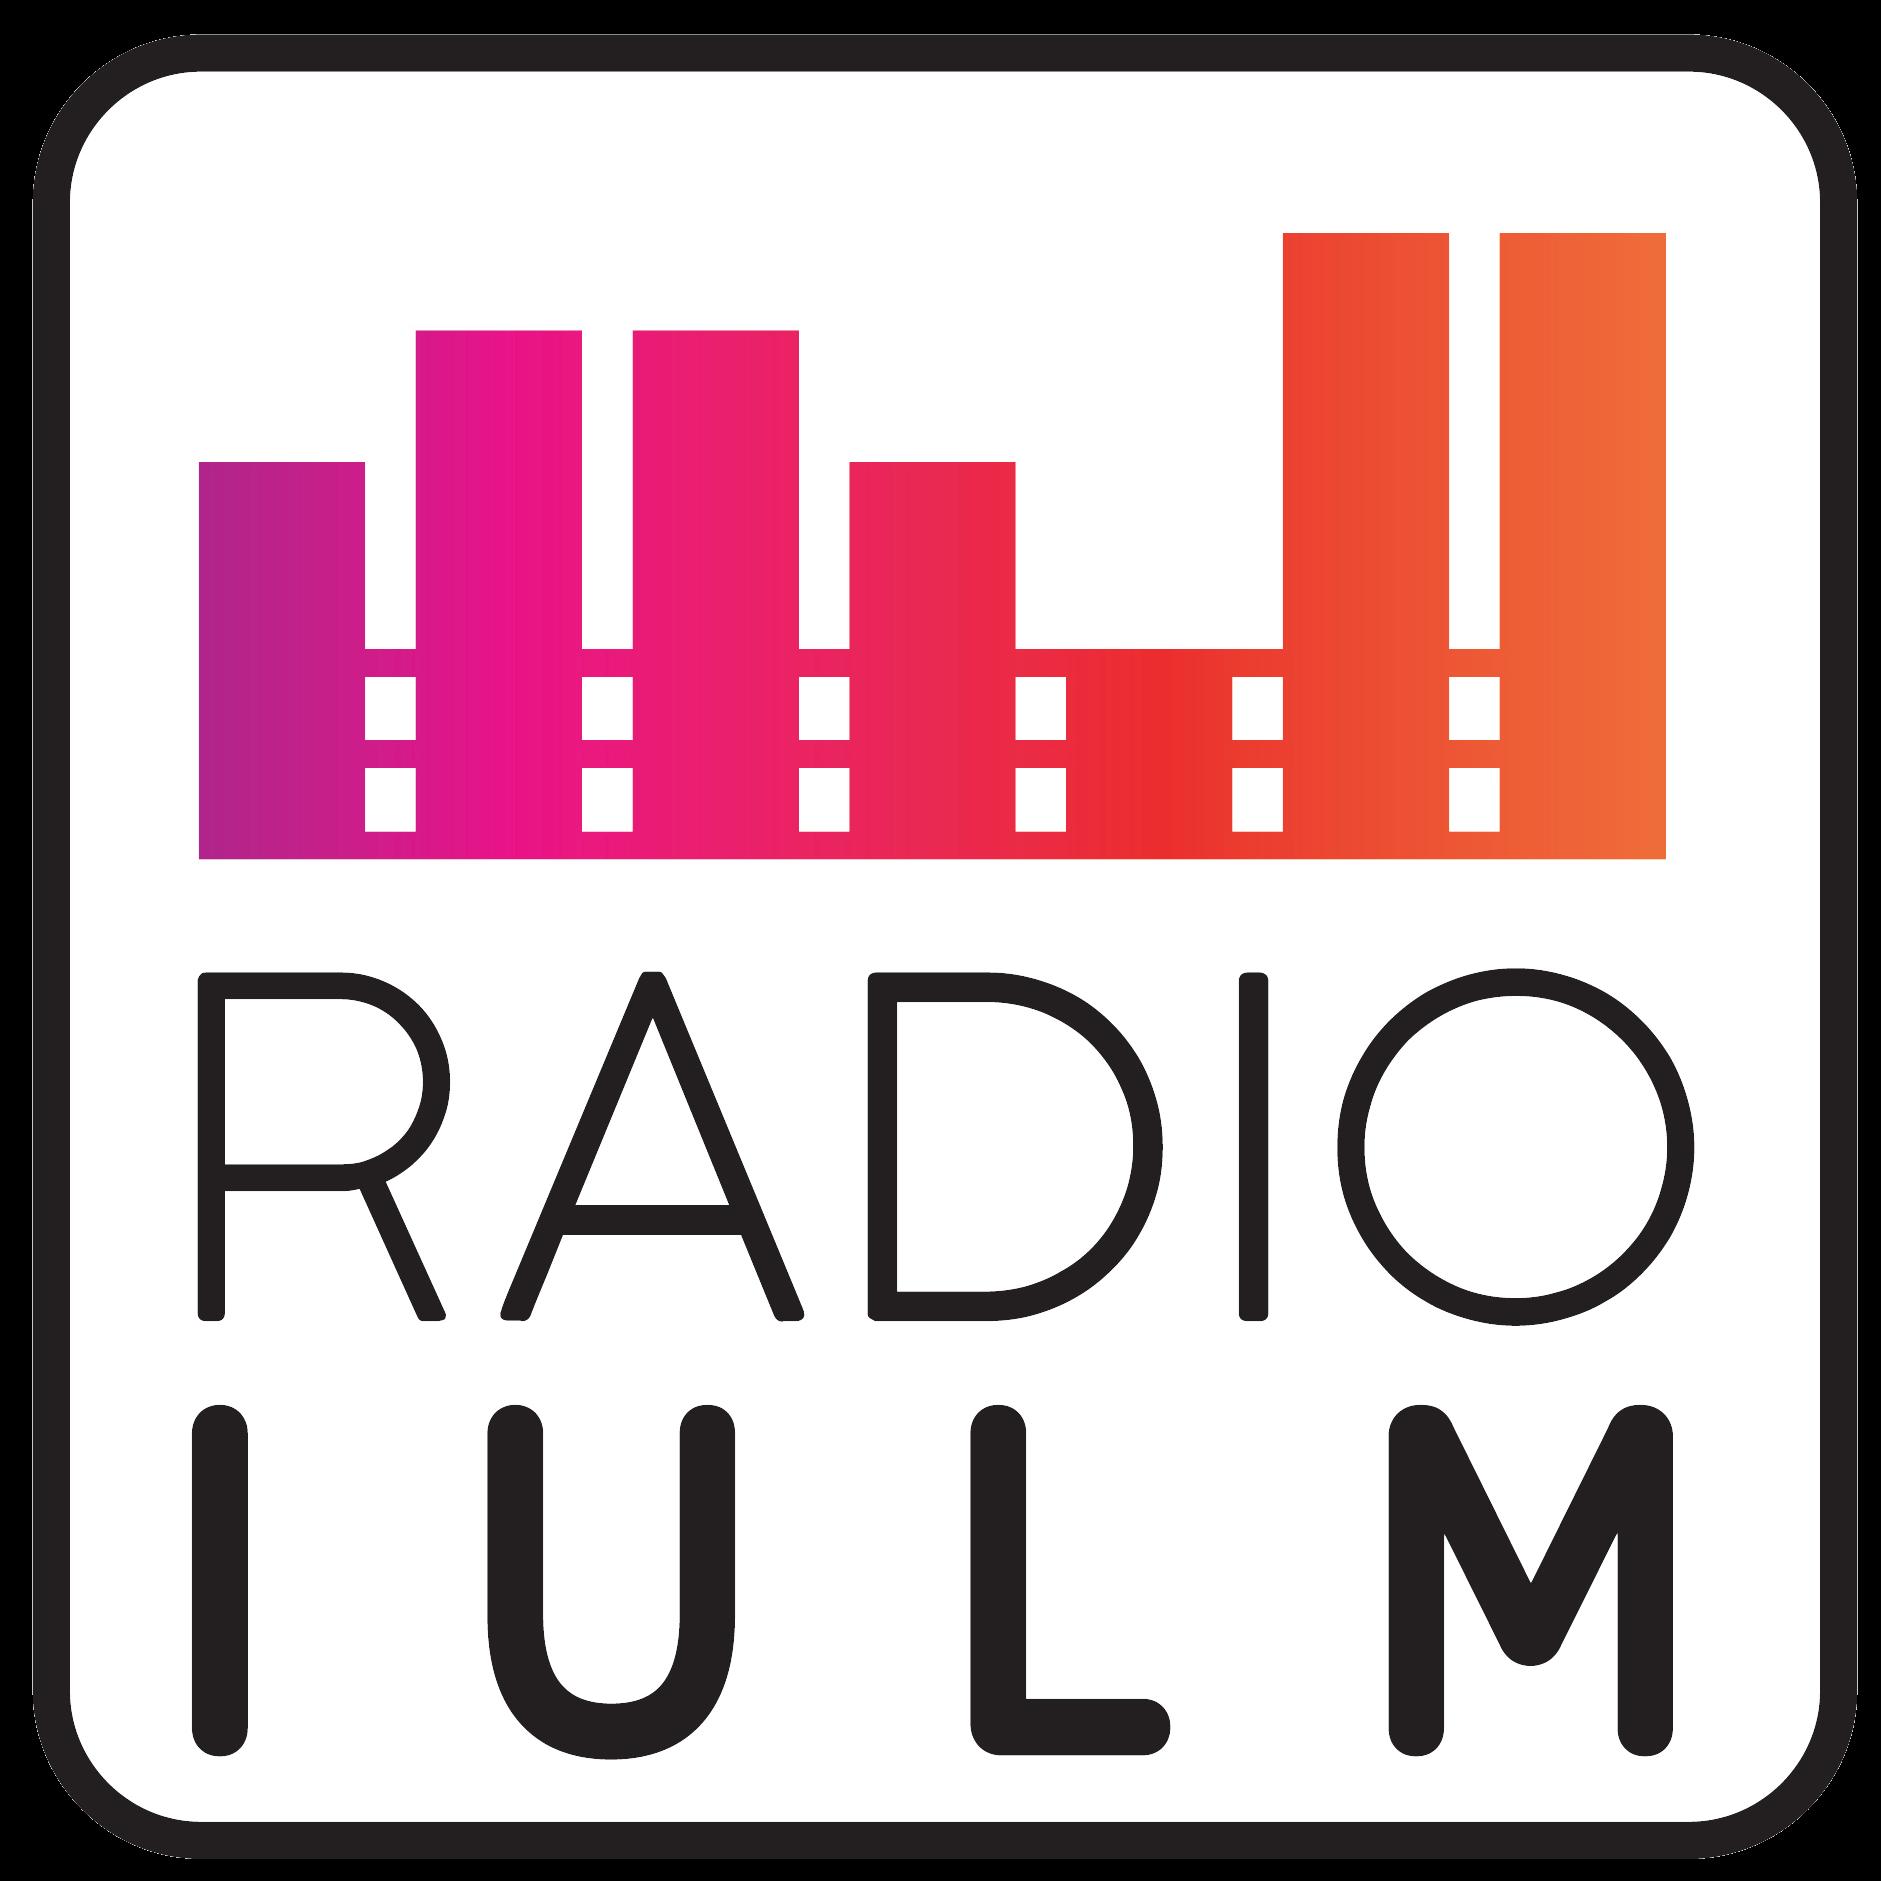 Radio IULM - Your way to play